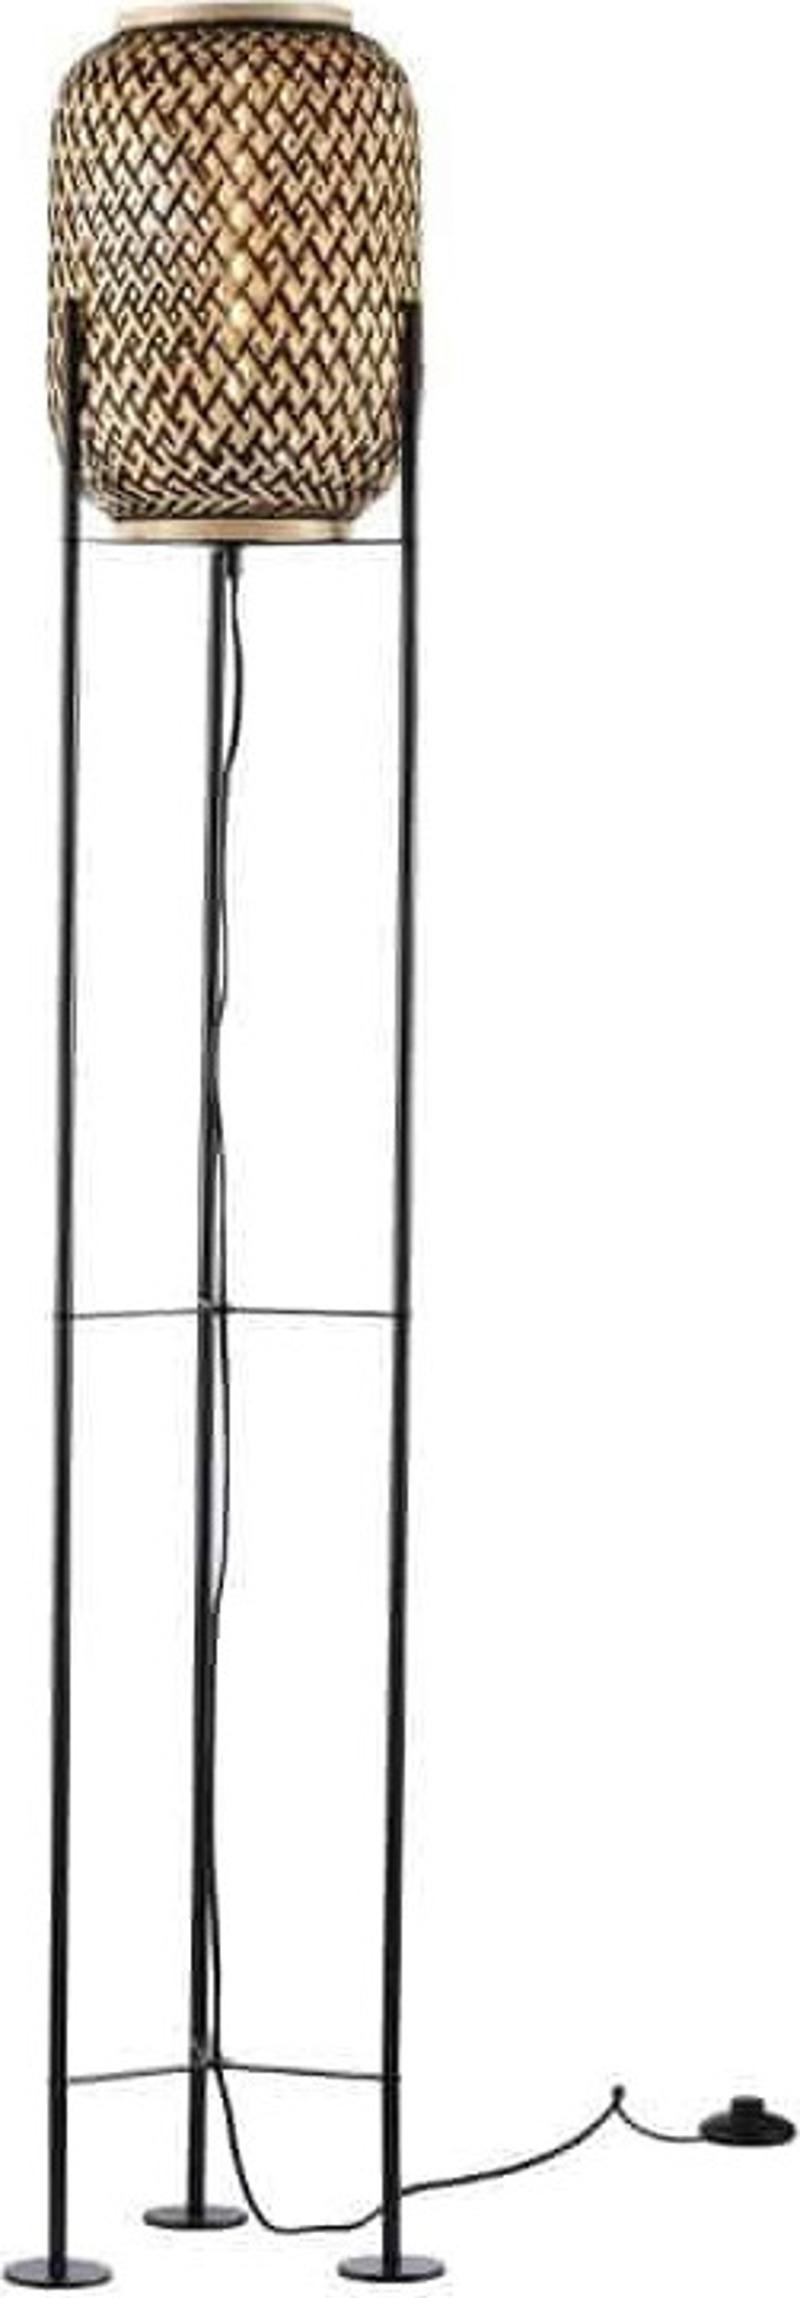 ACA Επιδαπέδιο Φωτιστικό Μεταλλικό/Bamboo 'Sahara' Μαύρο/Φυσικό Ε27 23Χ145cm AR3191F145NB